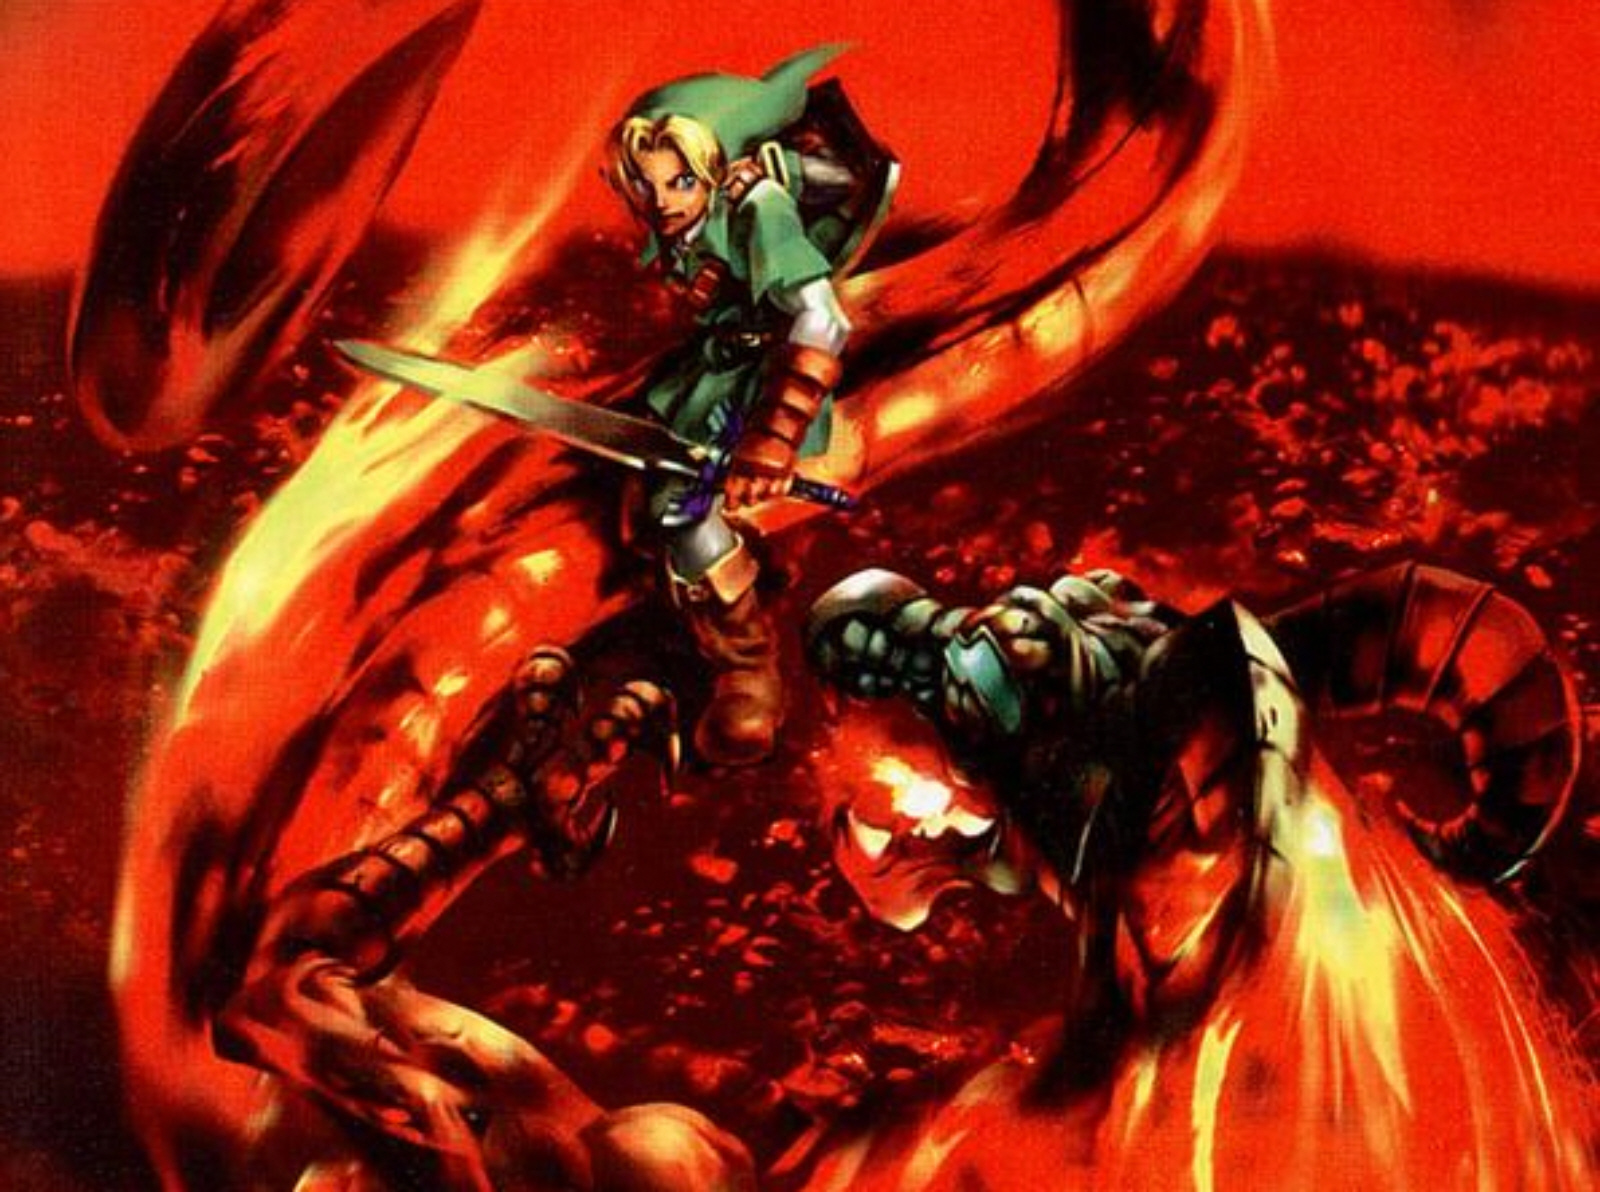 Ocarina Of Time 3d Wallpaper Boss Fight Fire Demon Volvagia